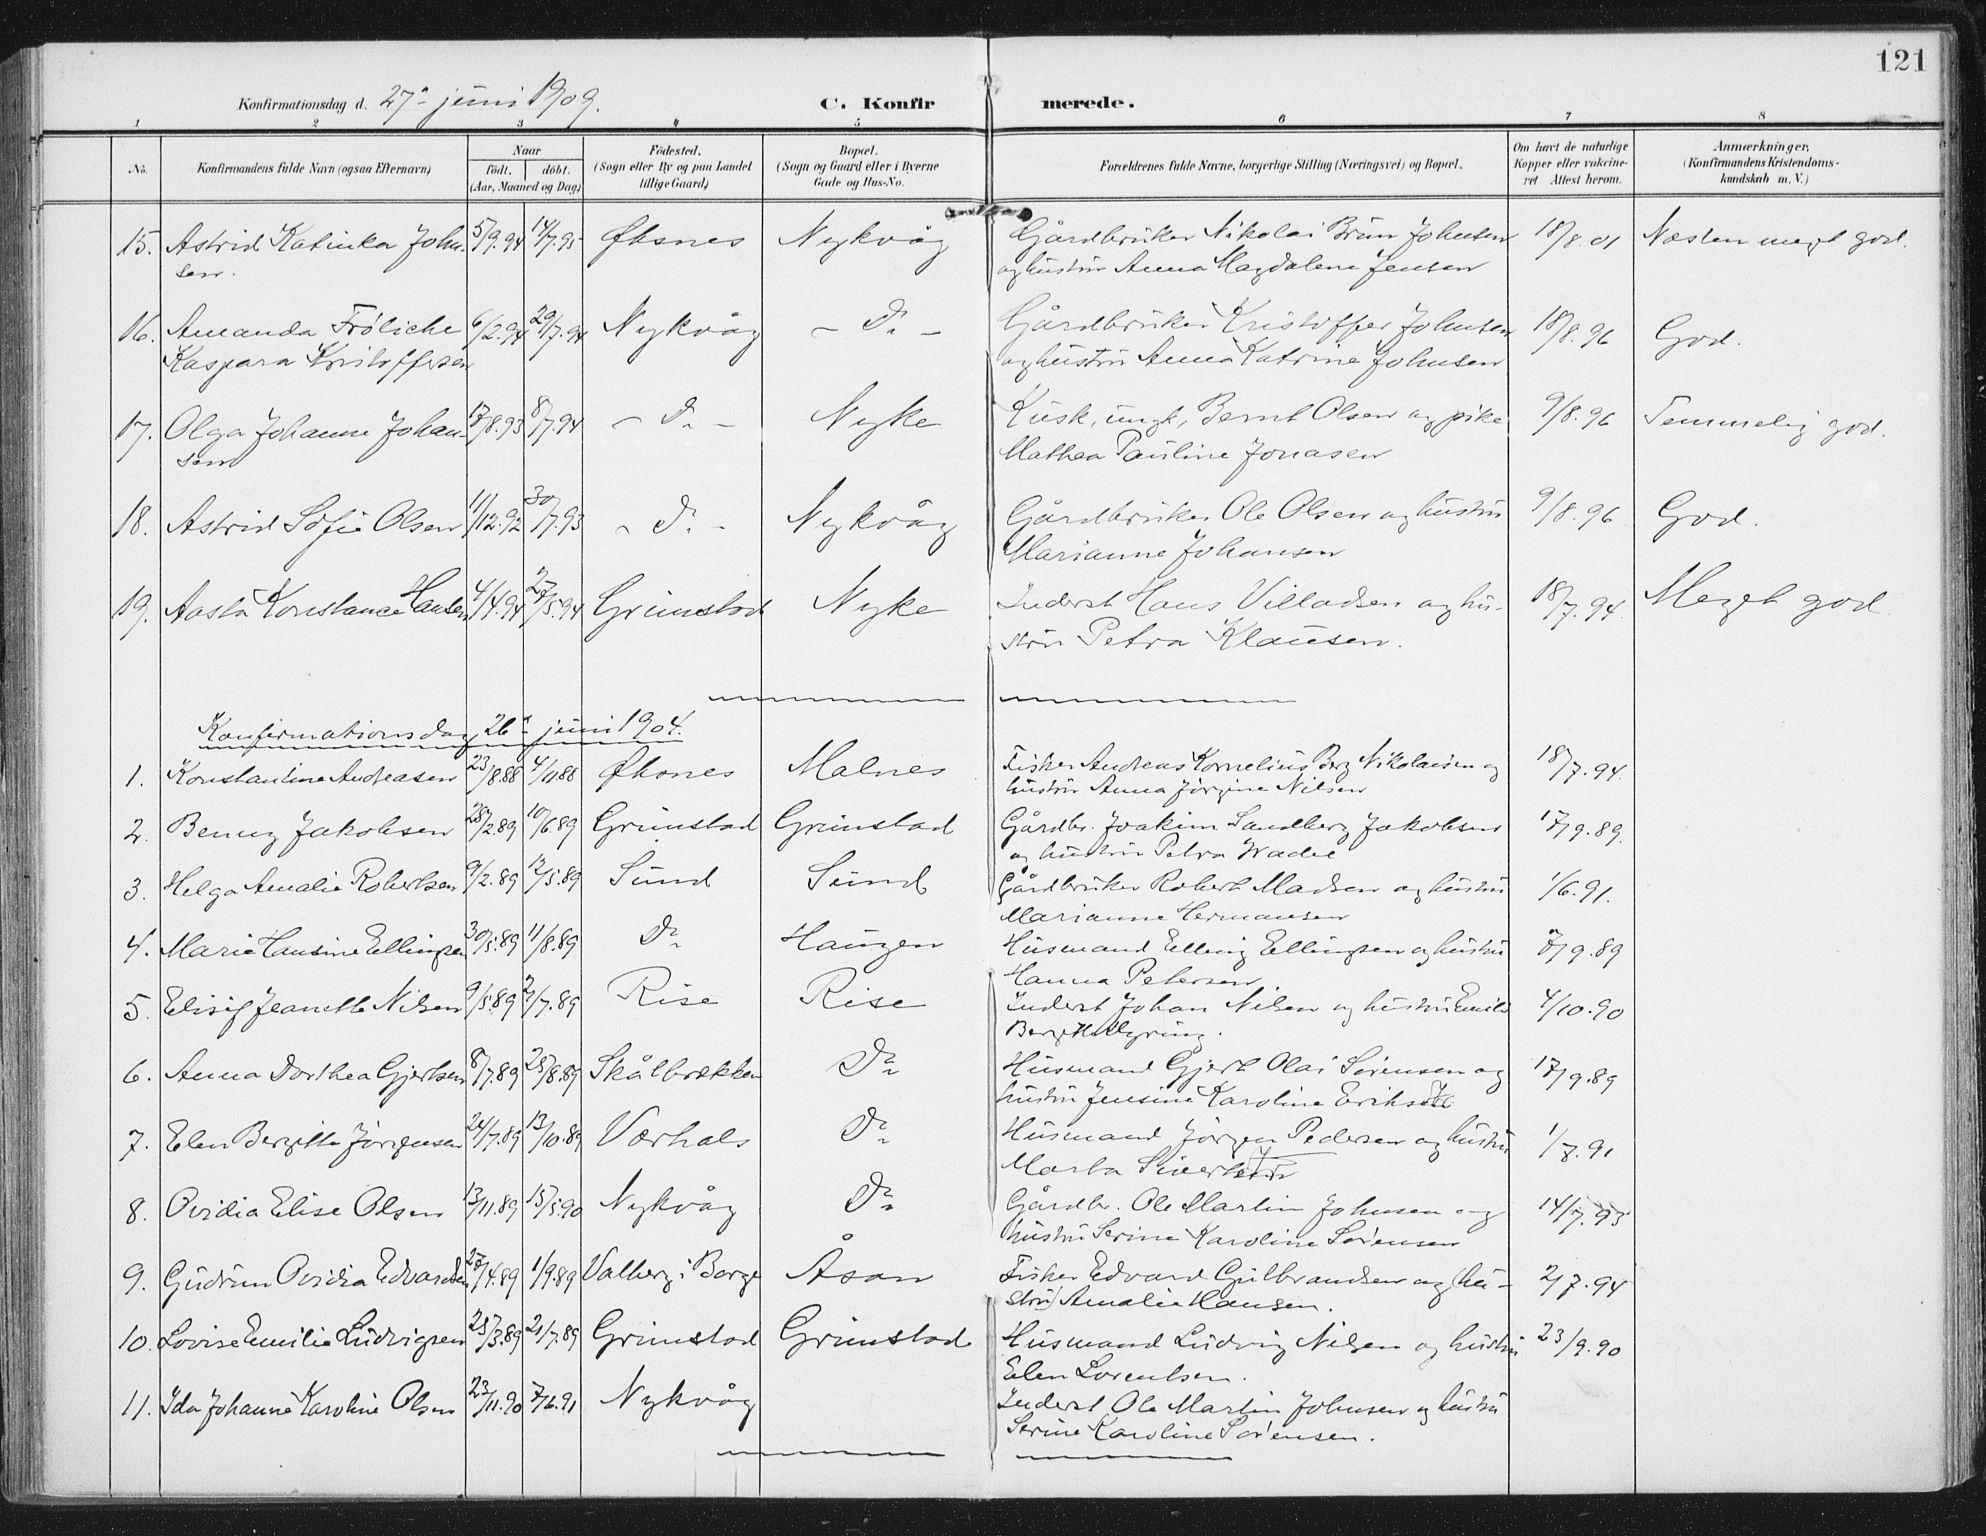 SAT, Ministerialprotokoller, klokkerbøker og fødselsregistre - Nordland, 892/L1321: Ministerialbok nr. 892A02, 1902-1918, s. 121